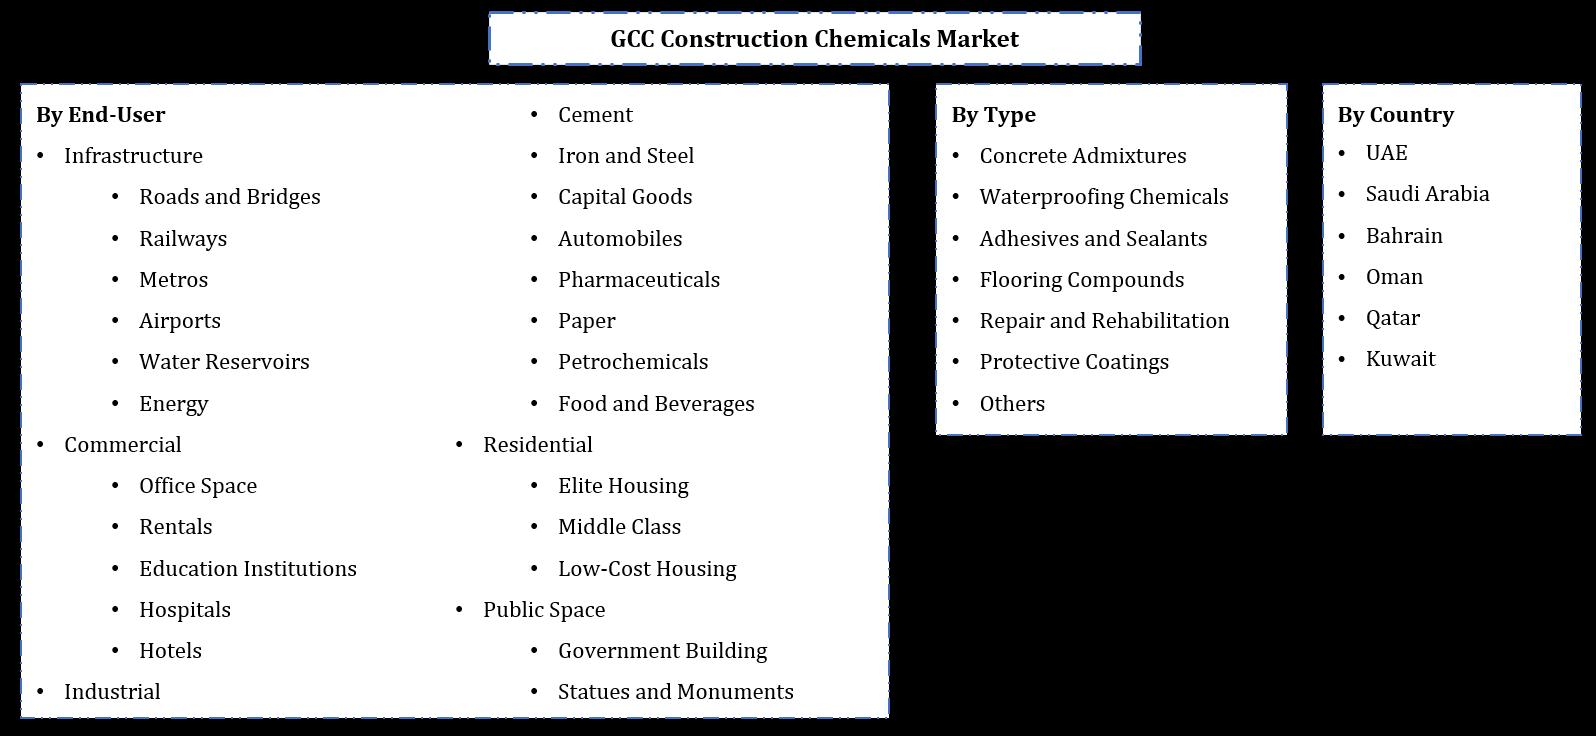 GCC Construction Chemicals Market Segmentation